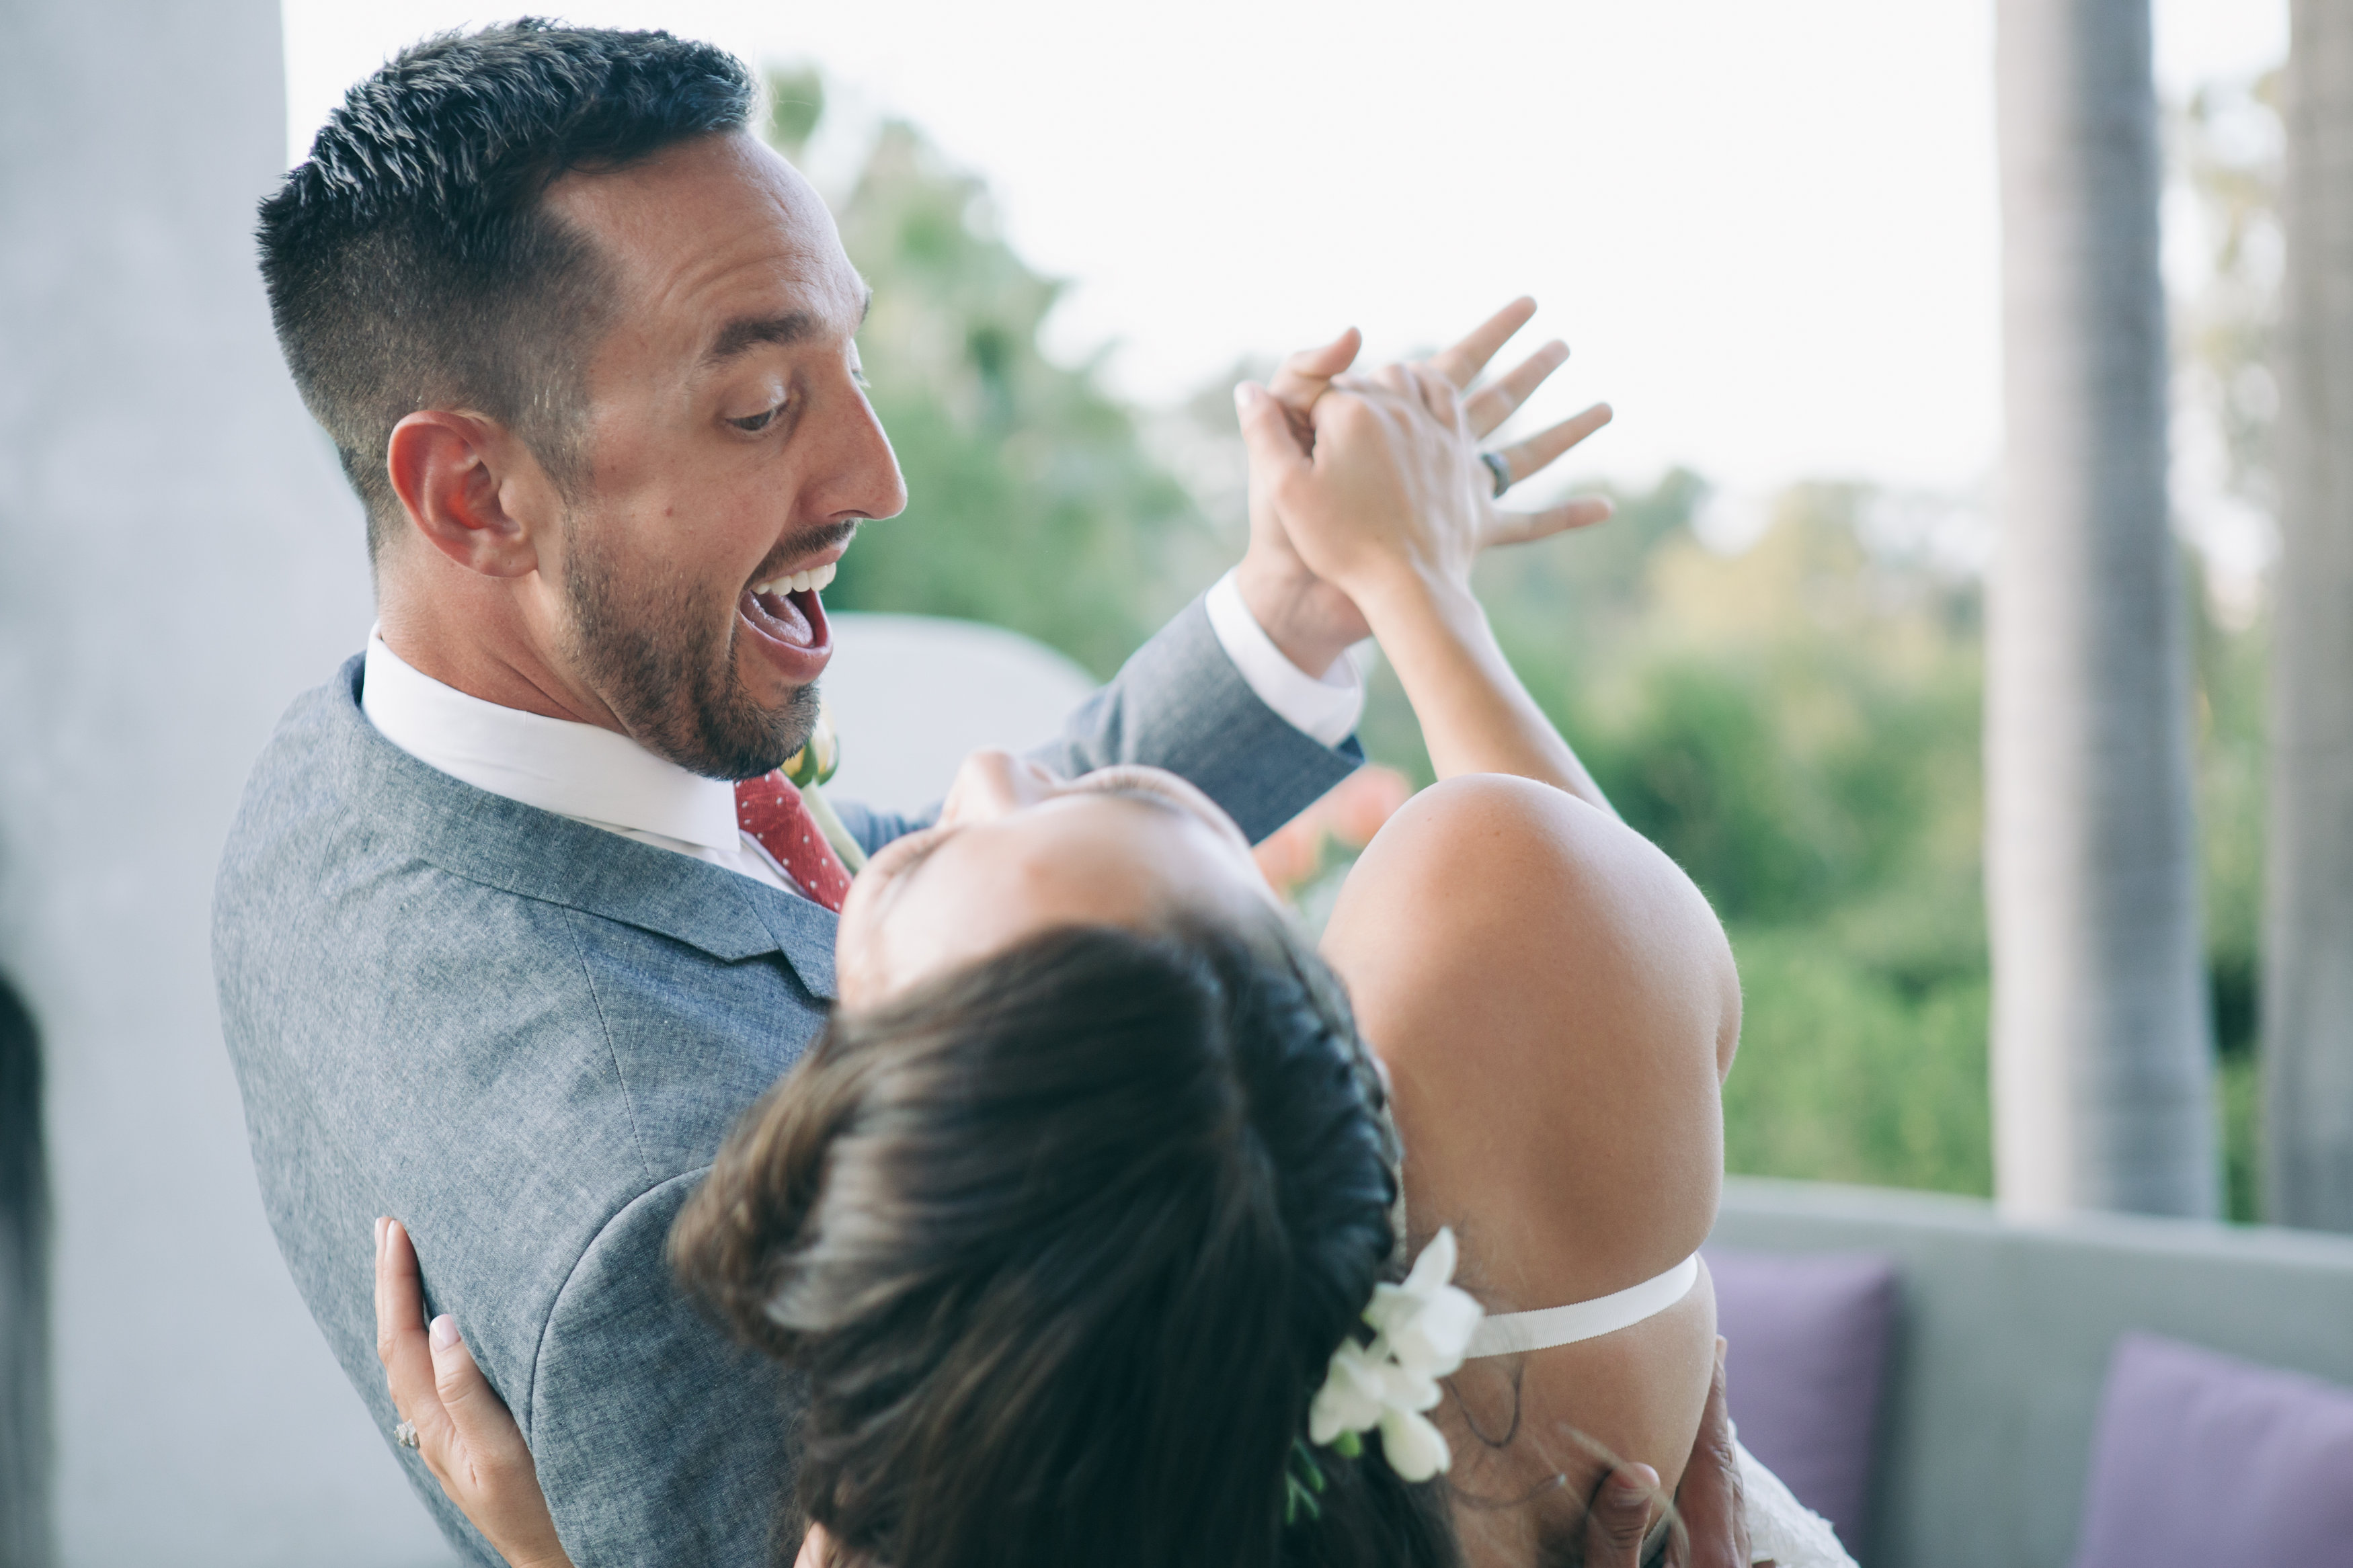 Mariage intimiste au bord de la plage - Ma Vie de Boheme